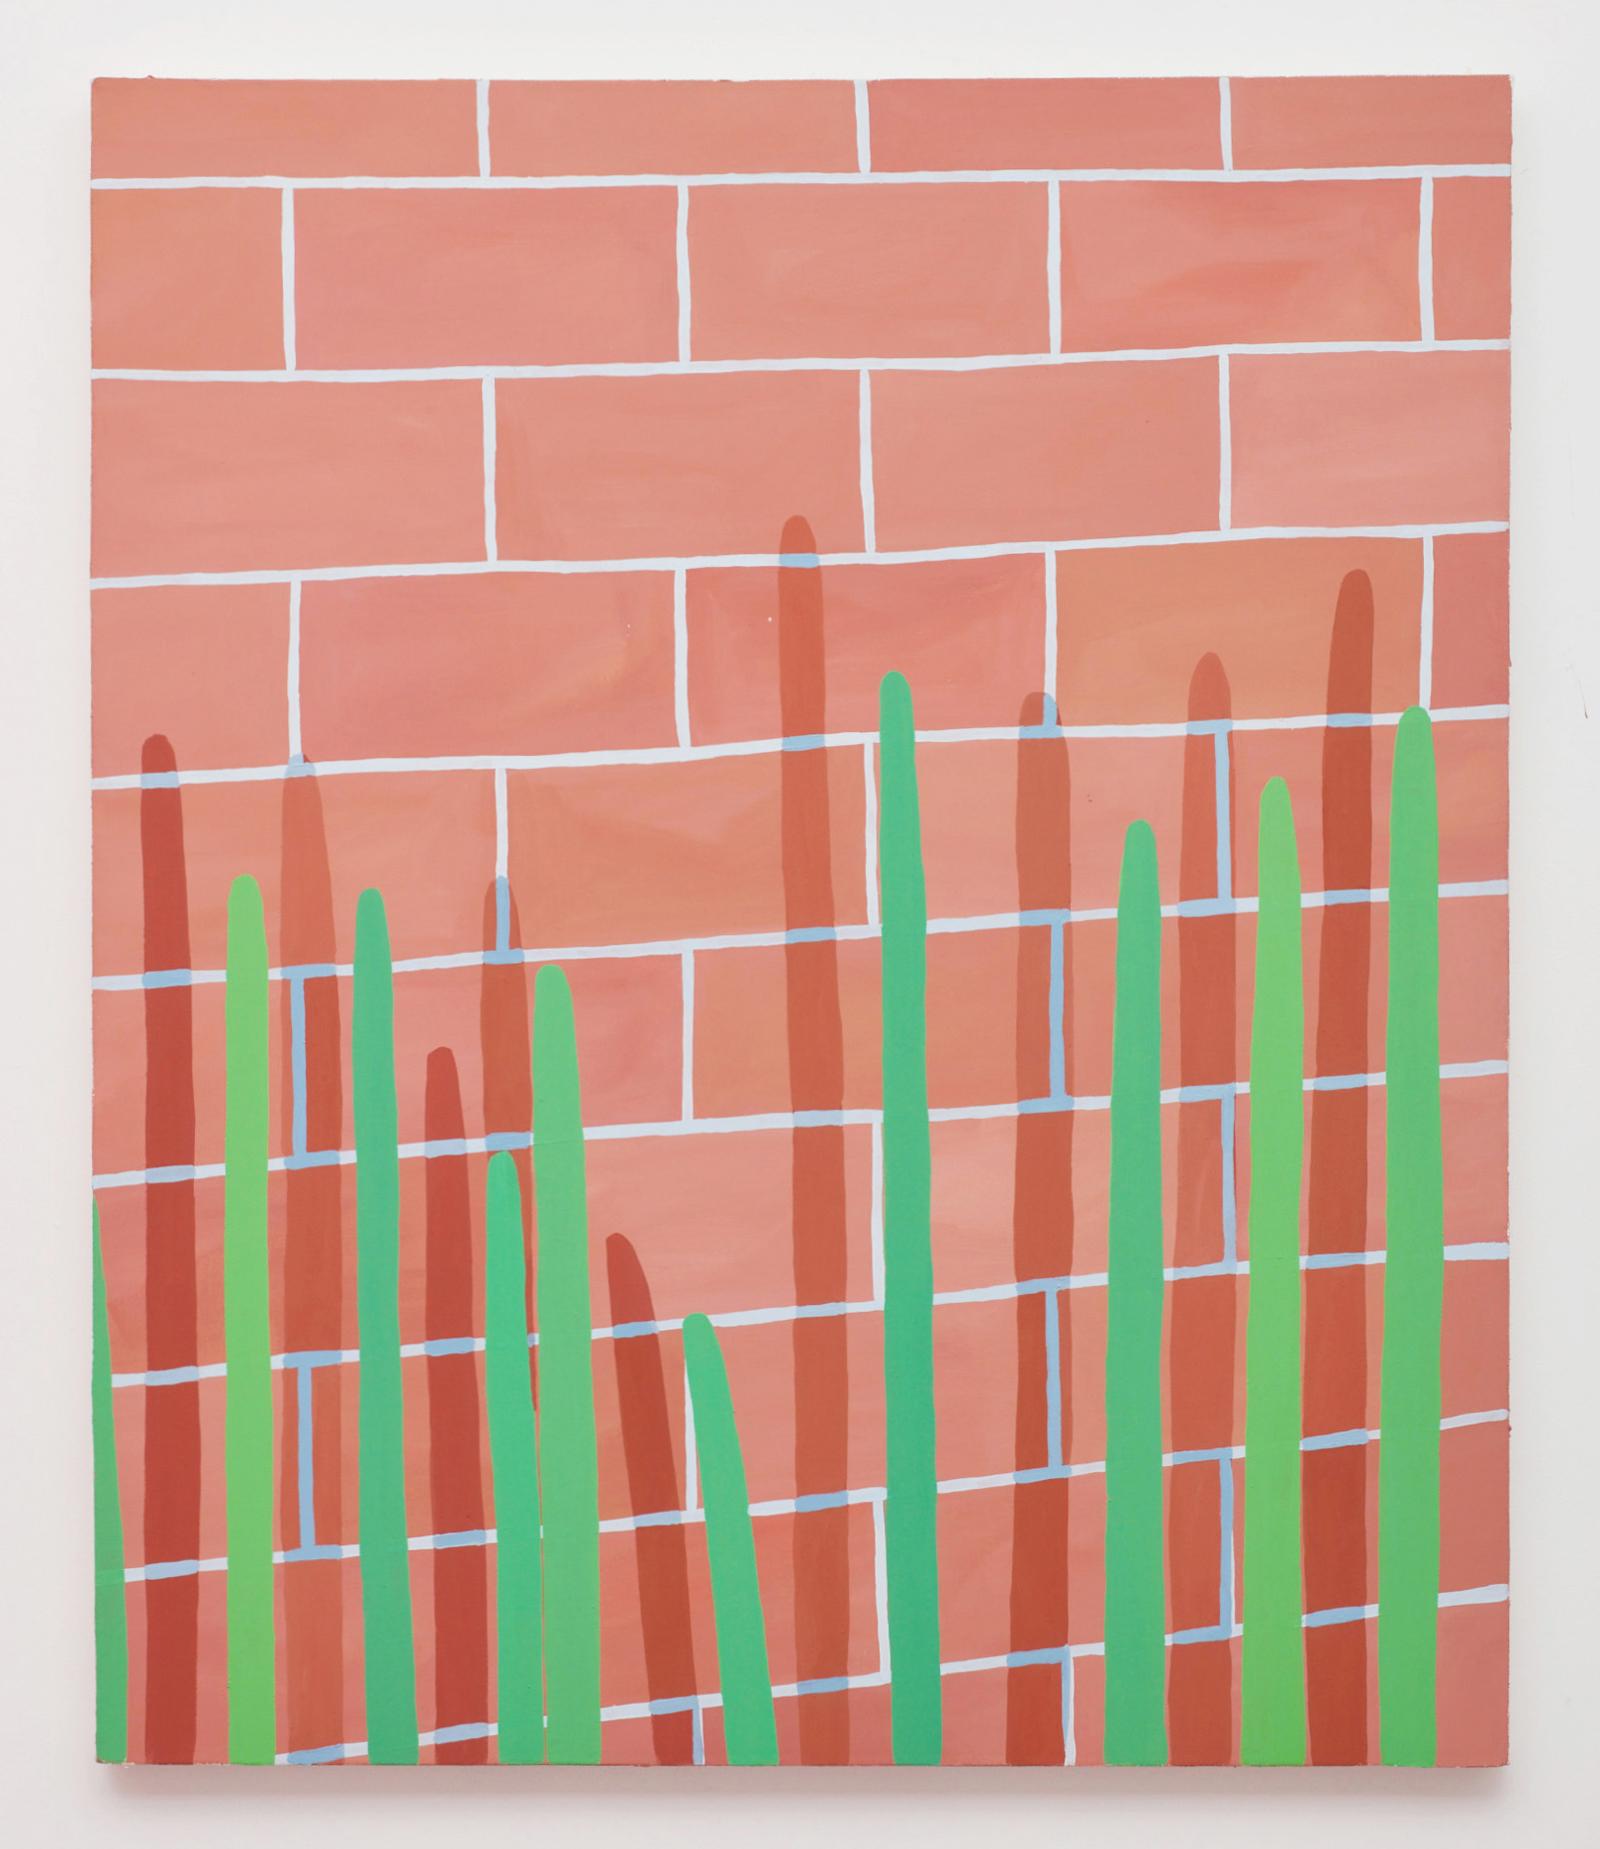 Corydon Cowansage, Wall #4, 2015, 38 x 32 inches,  acrylic on canvas